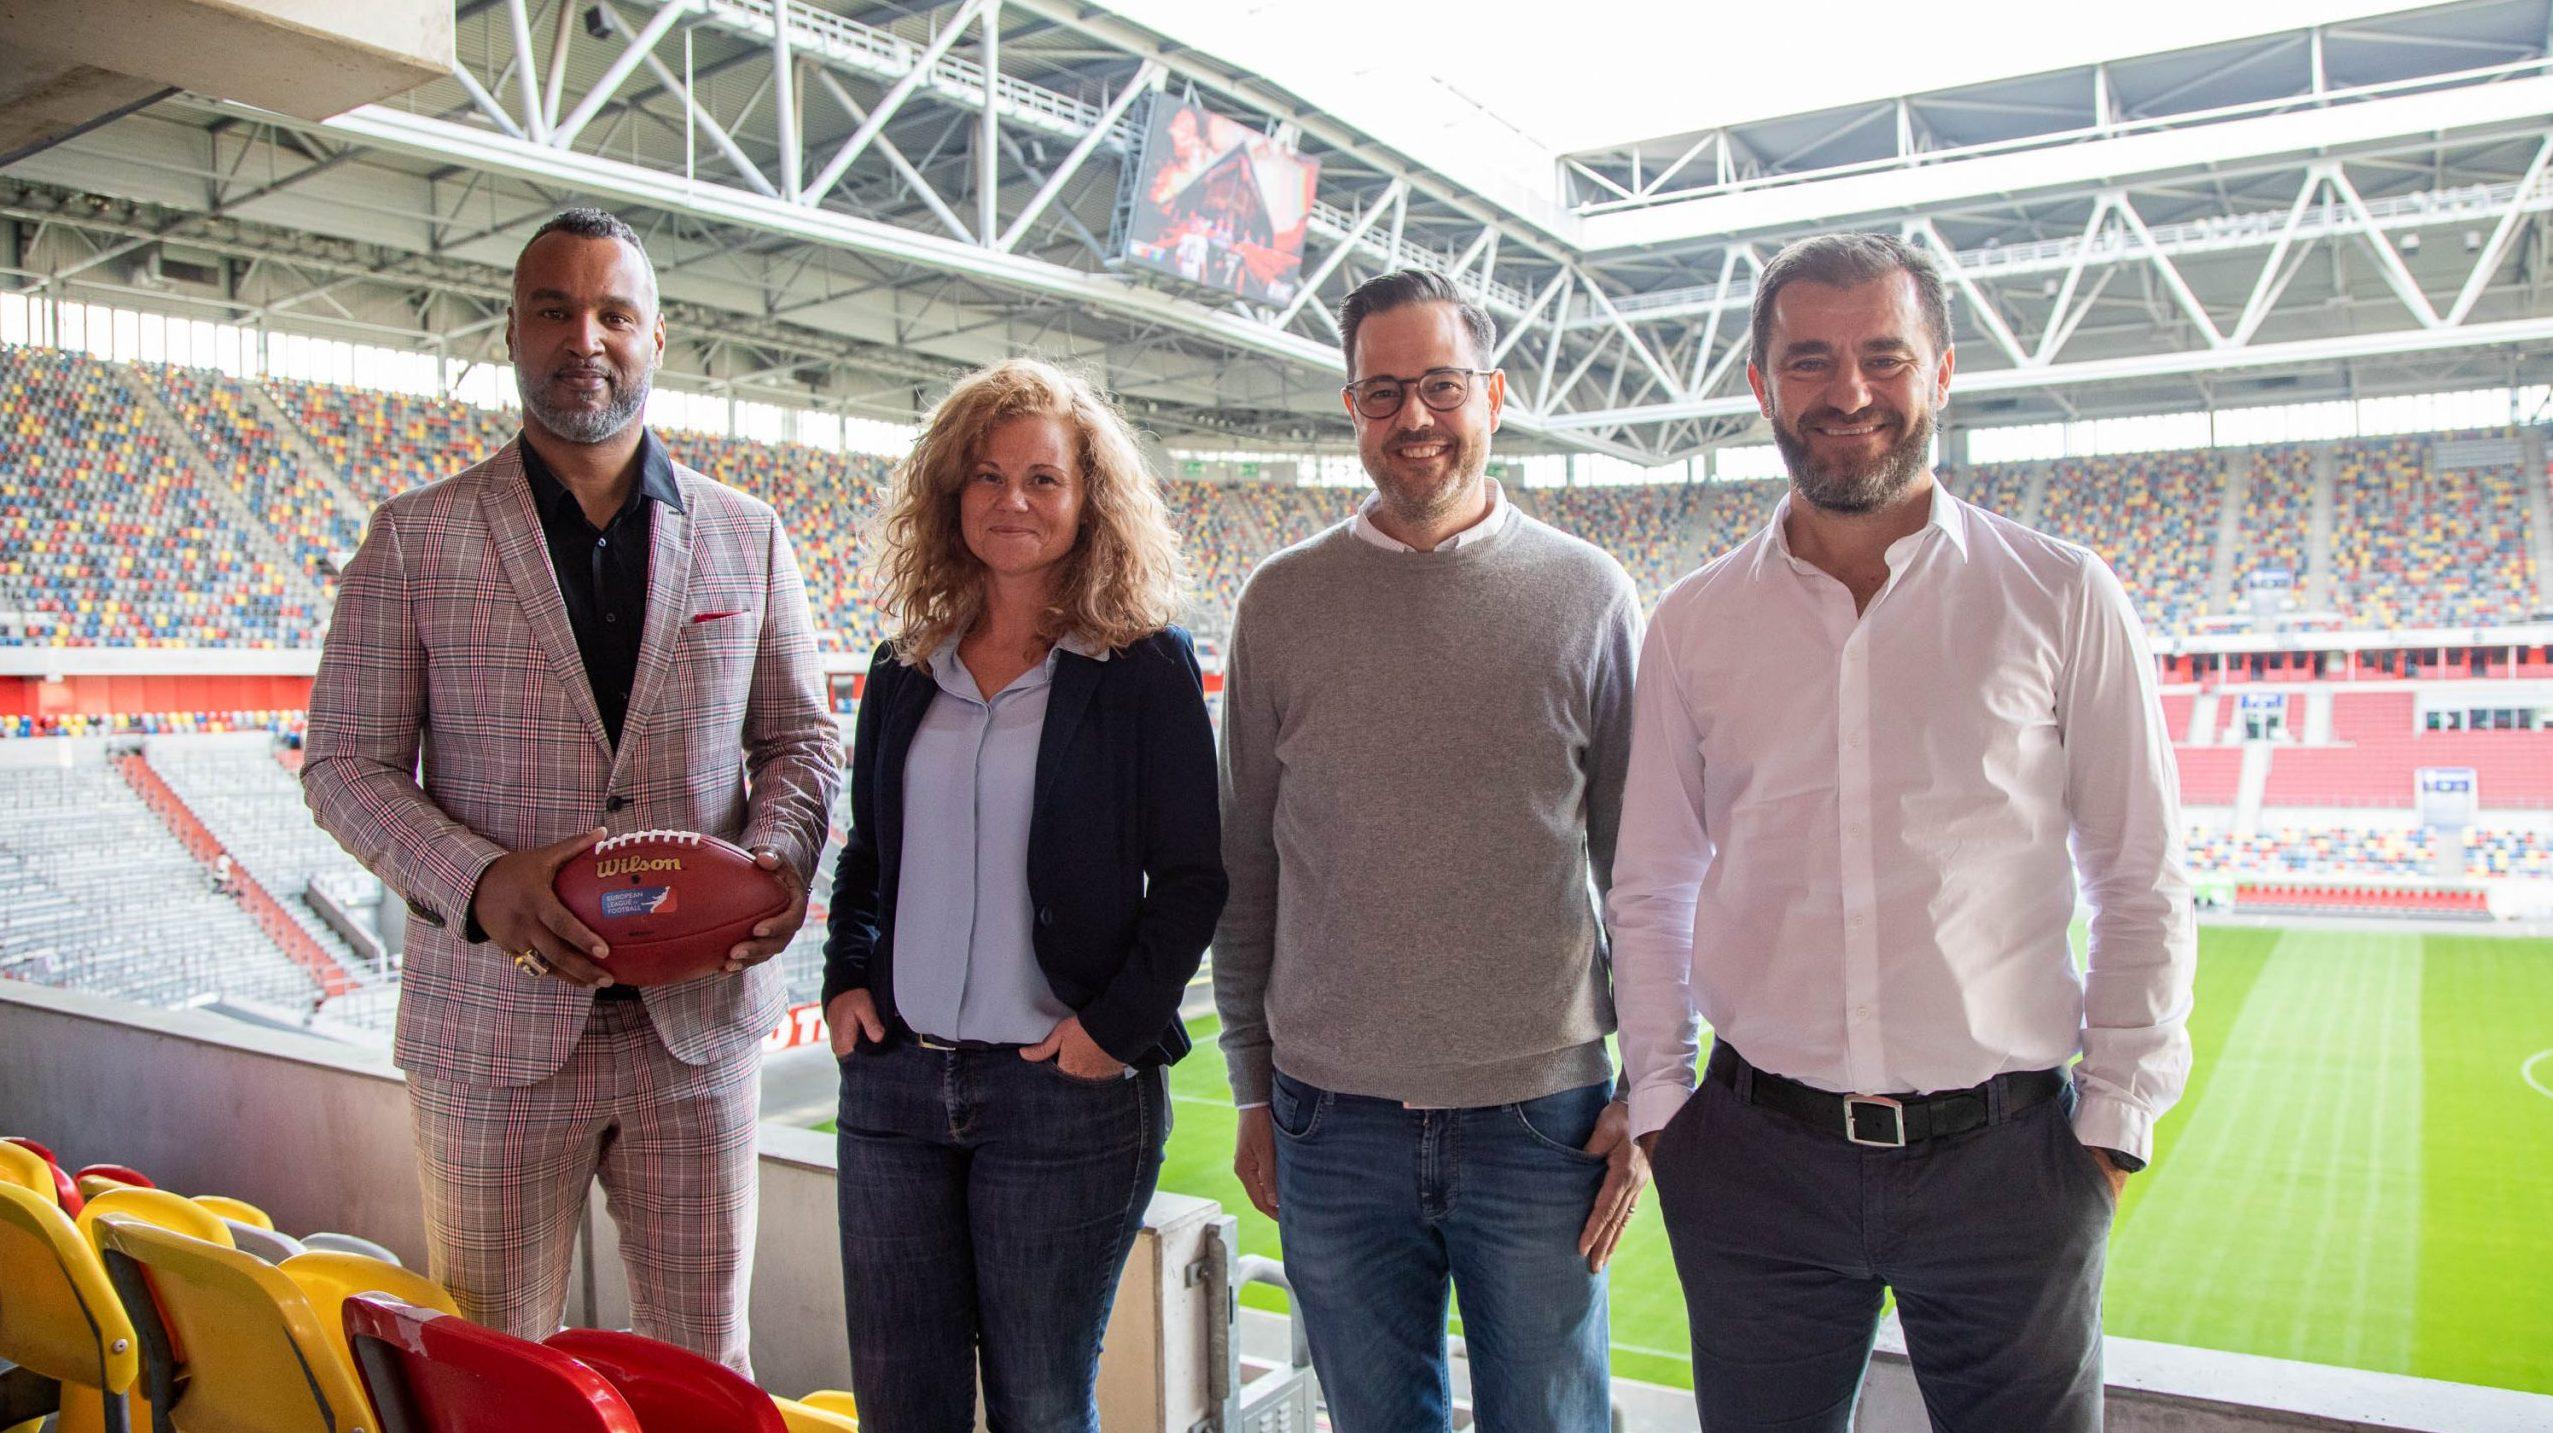 European League of Football schaut auf Championship Game!